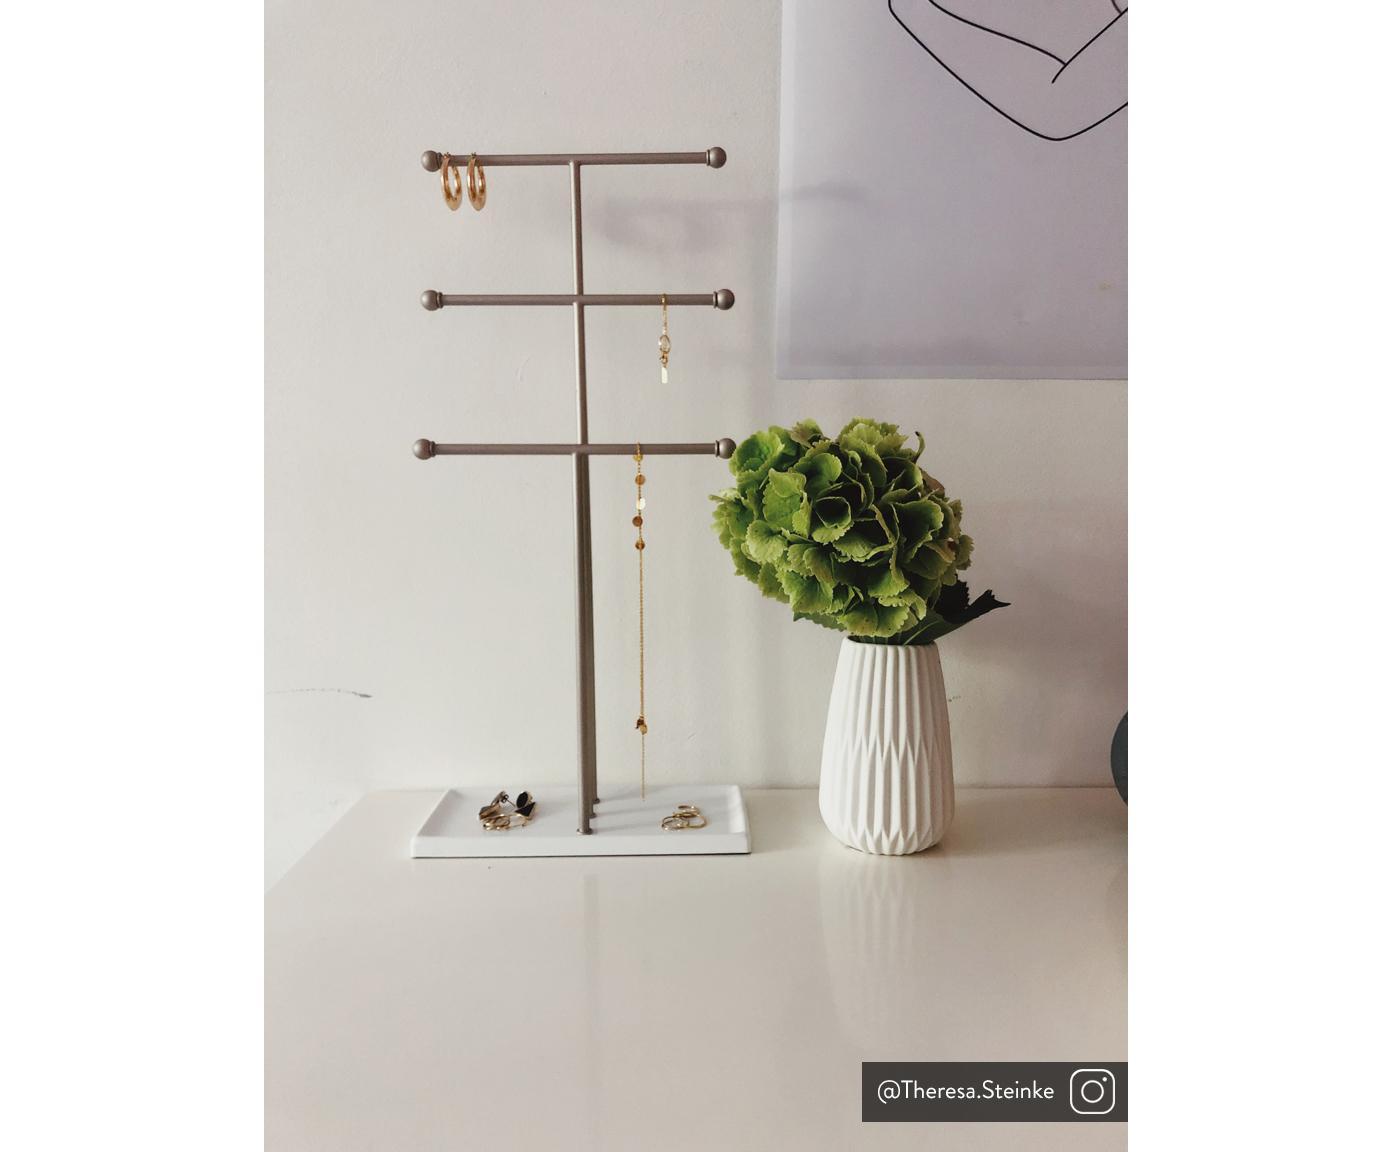 Sieradenhouder Trigem, Frame: vernikkeld metaal, Poten: gelakt metaal, Nikkelkleurig, wit, 23 x 48 cm